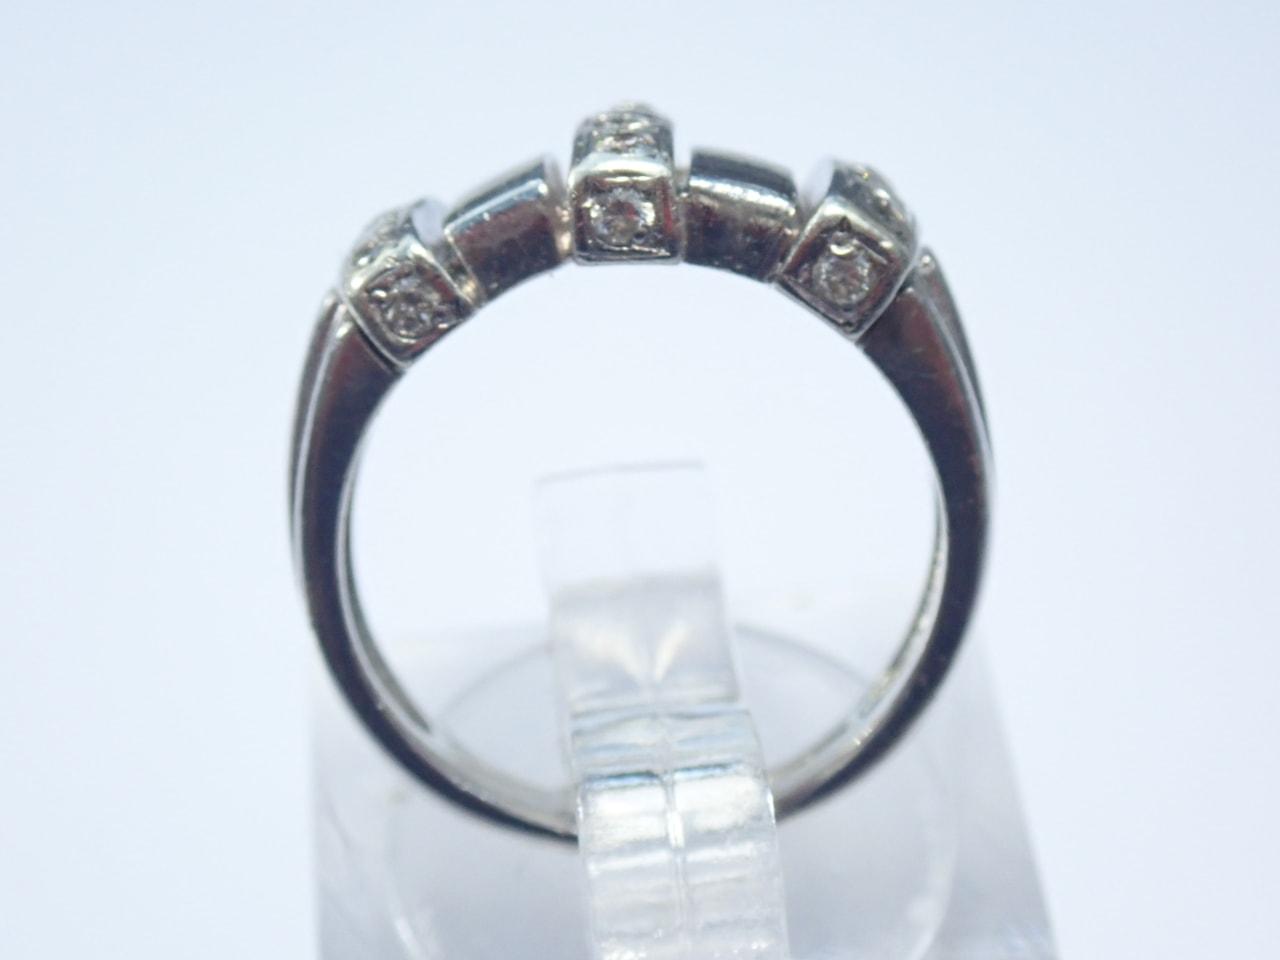 9ct Gold Diamond Ring - White Gold Size I- 5.1 grams